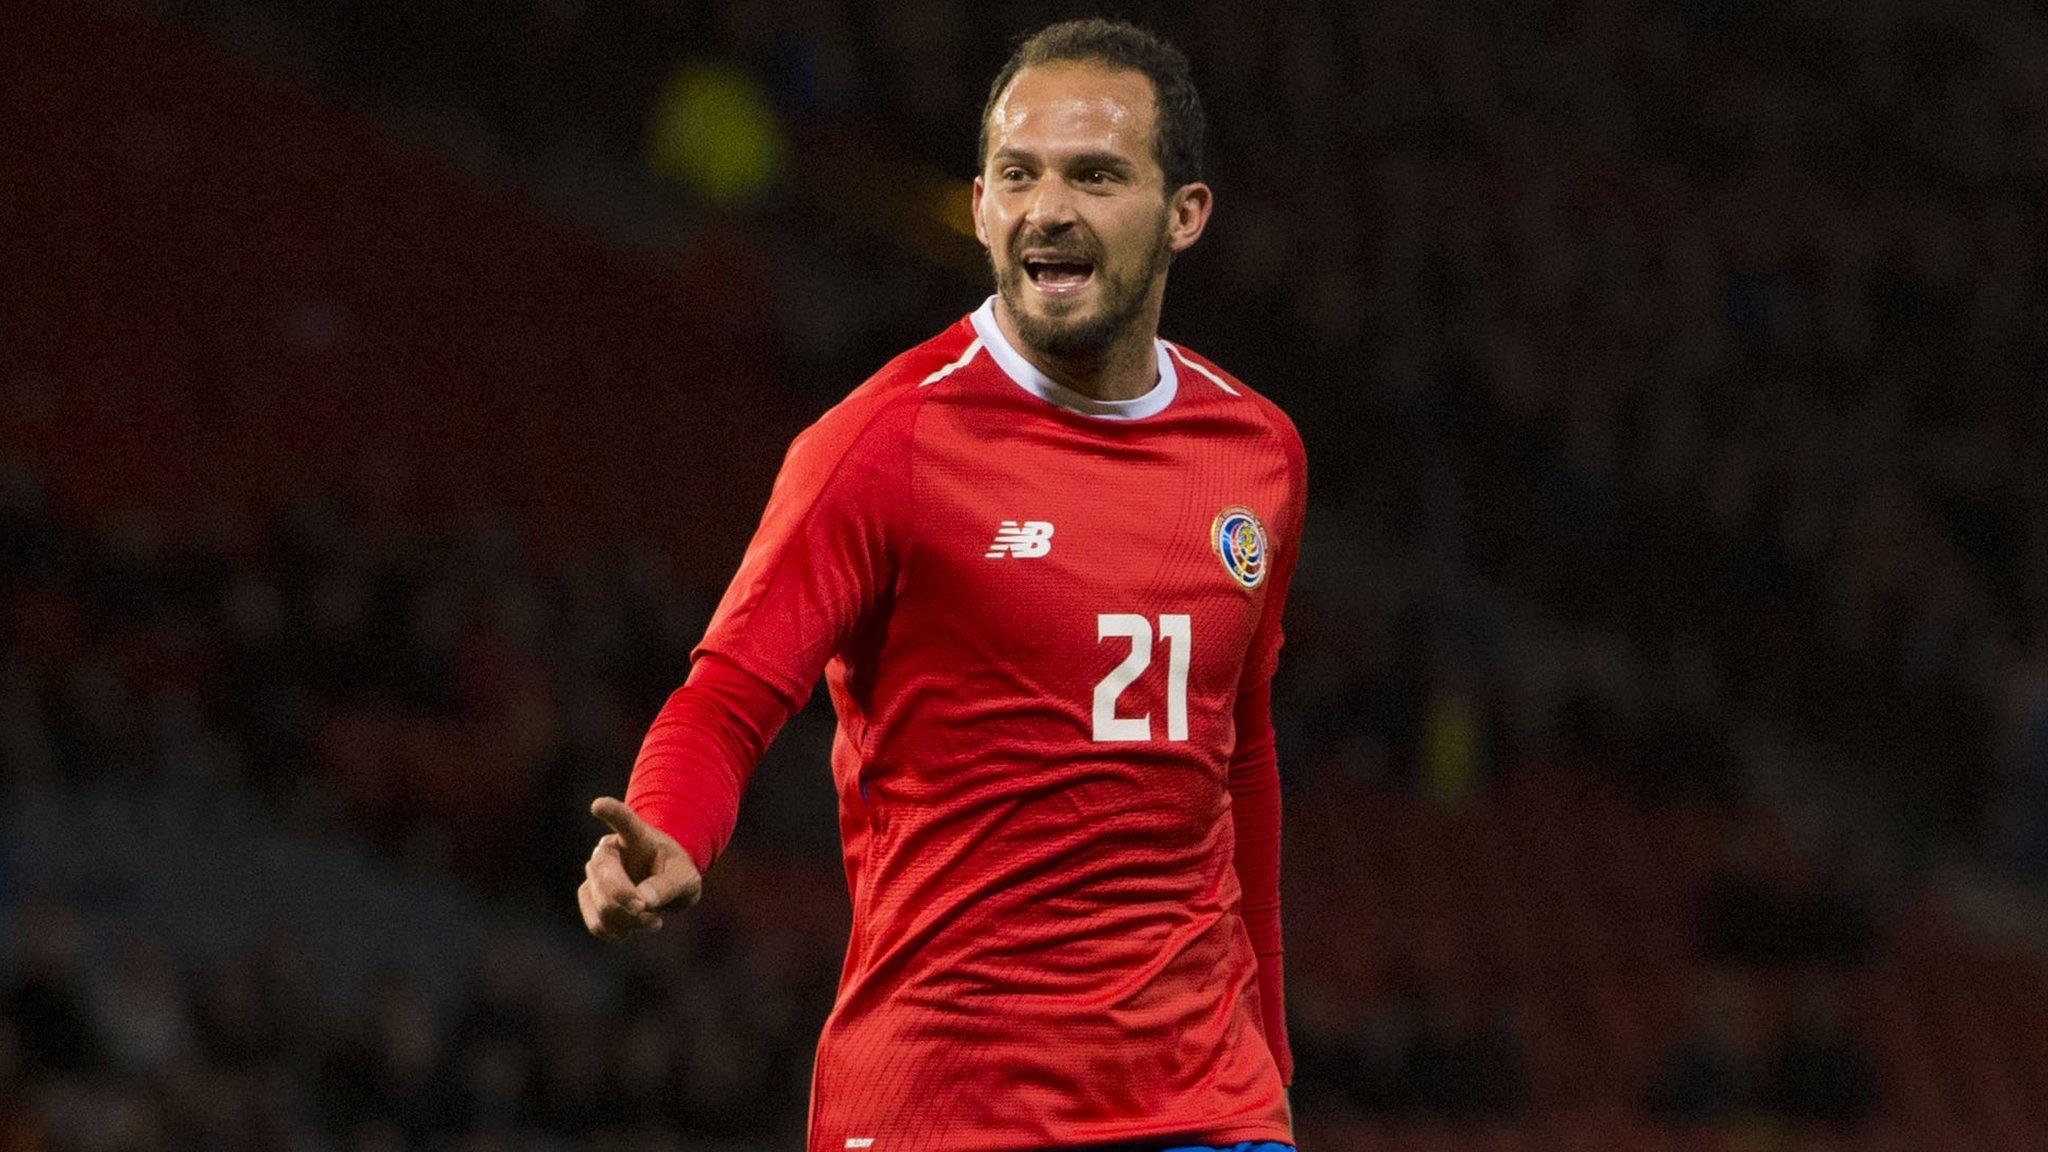 Scotland lose to Costa Rica on McLeish's return